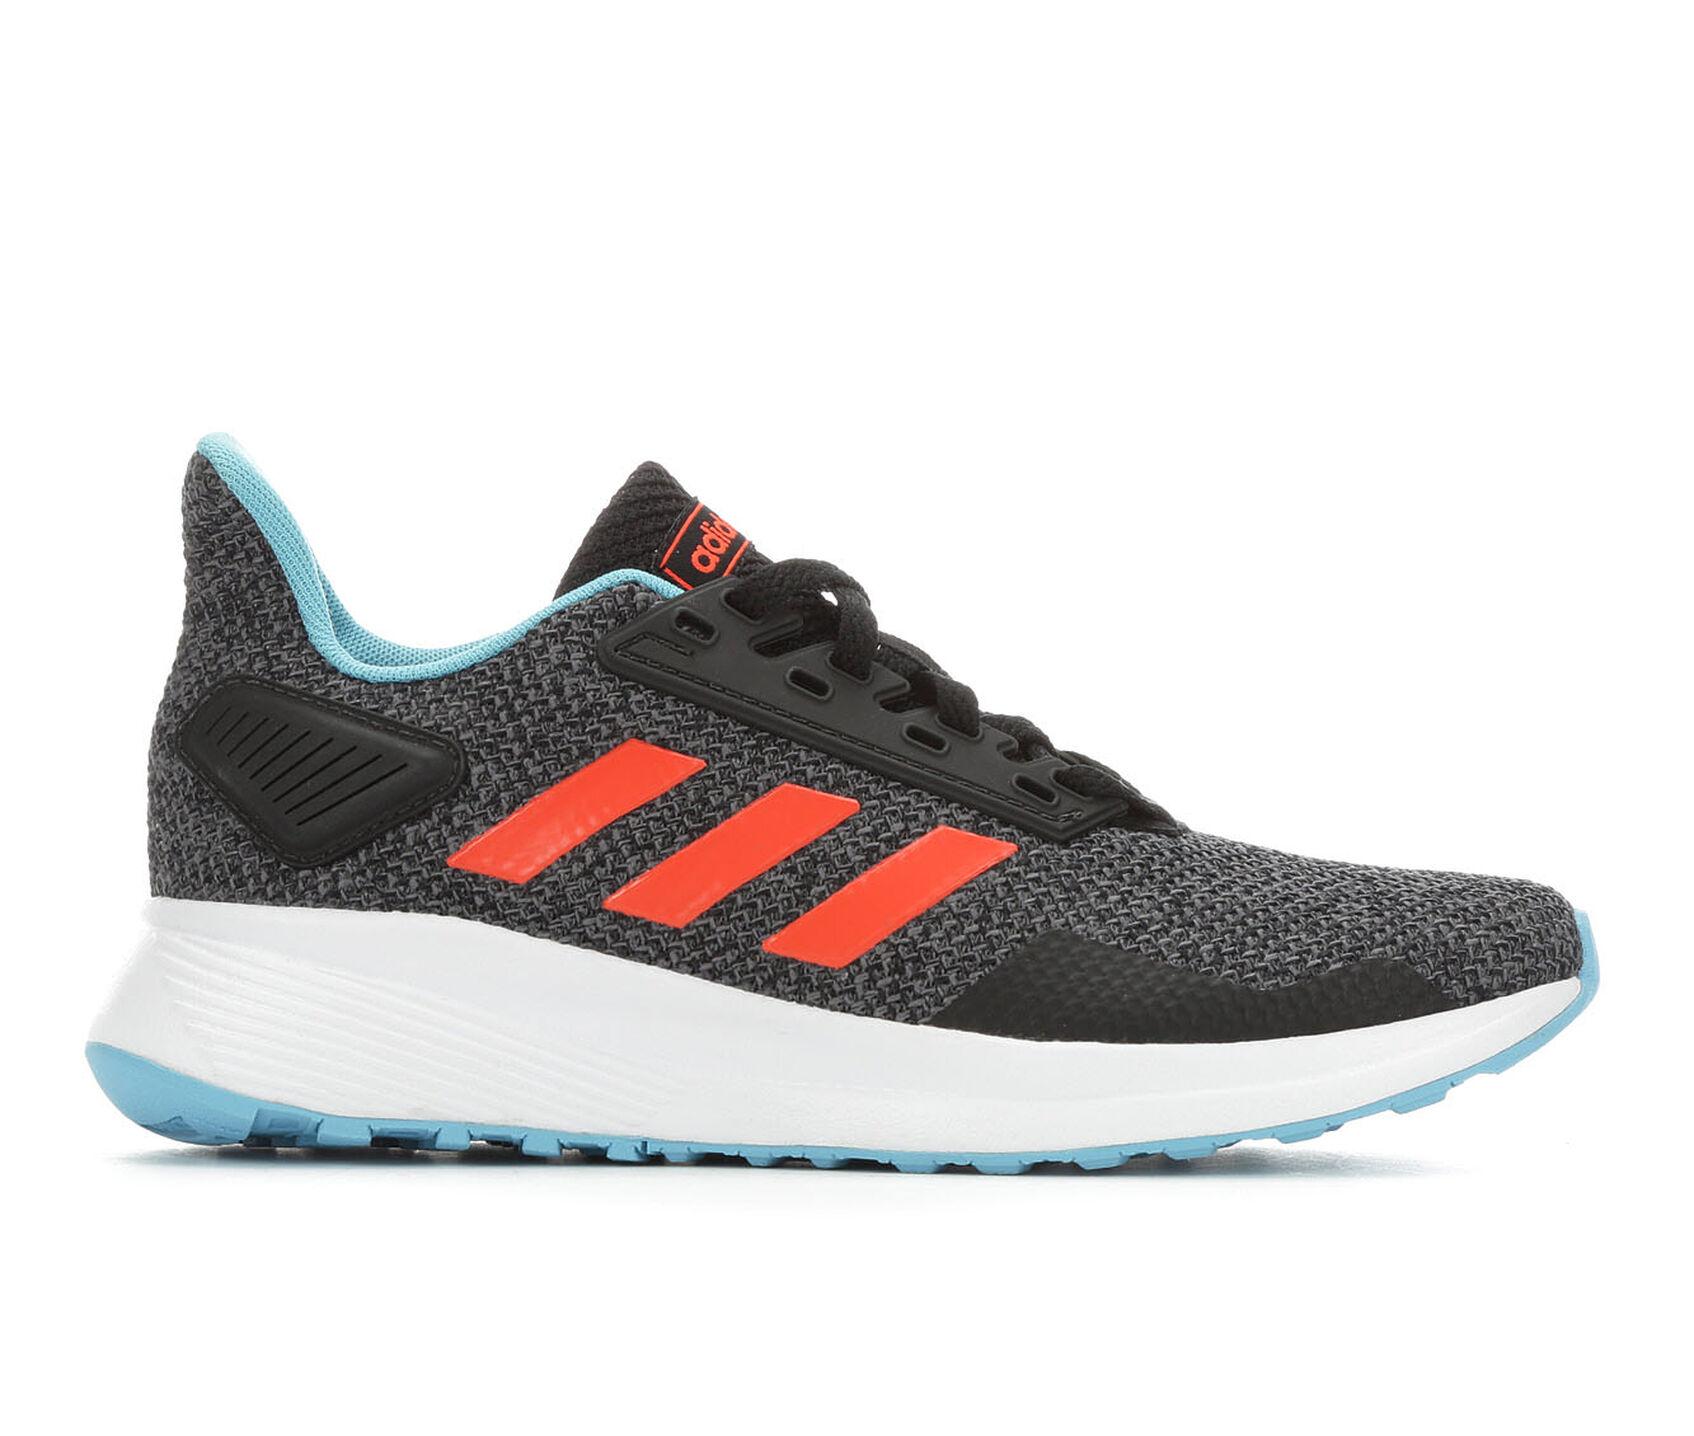 low priced eb9fa 810e0 Boys  39  Adidas Little Kid  amp  Big Kid Duramo Running Shoes. Previous